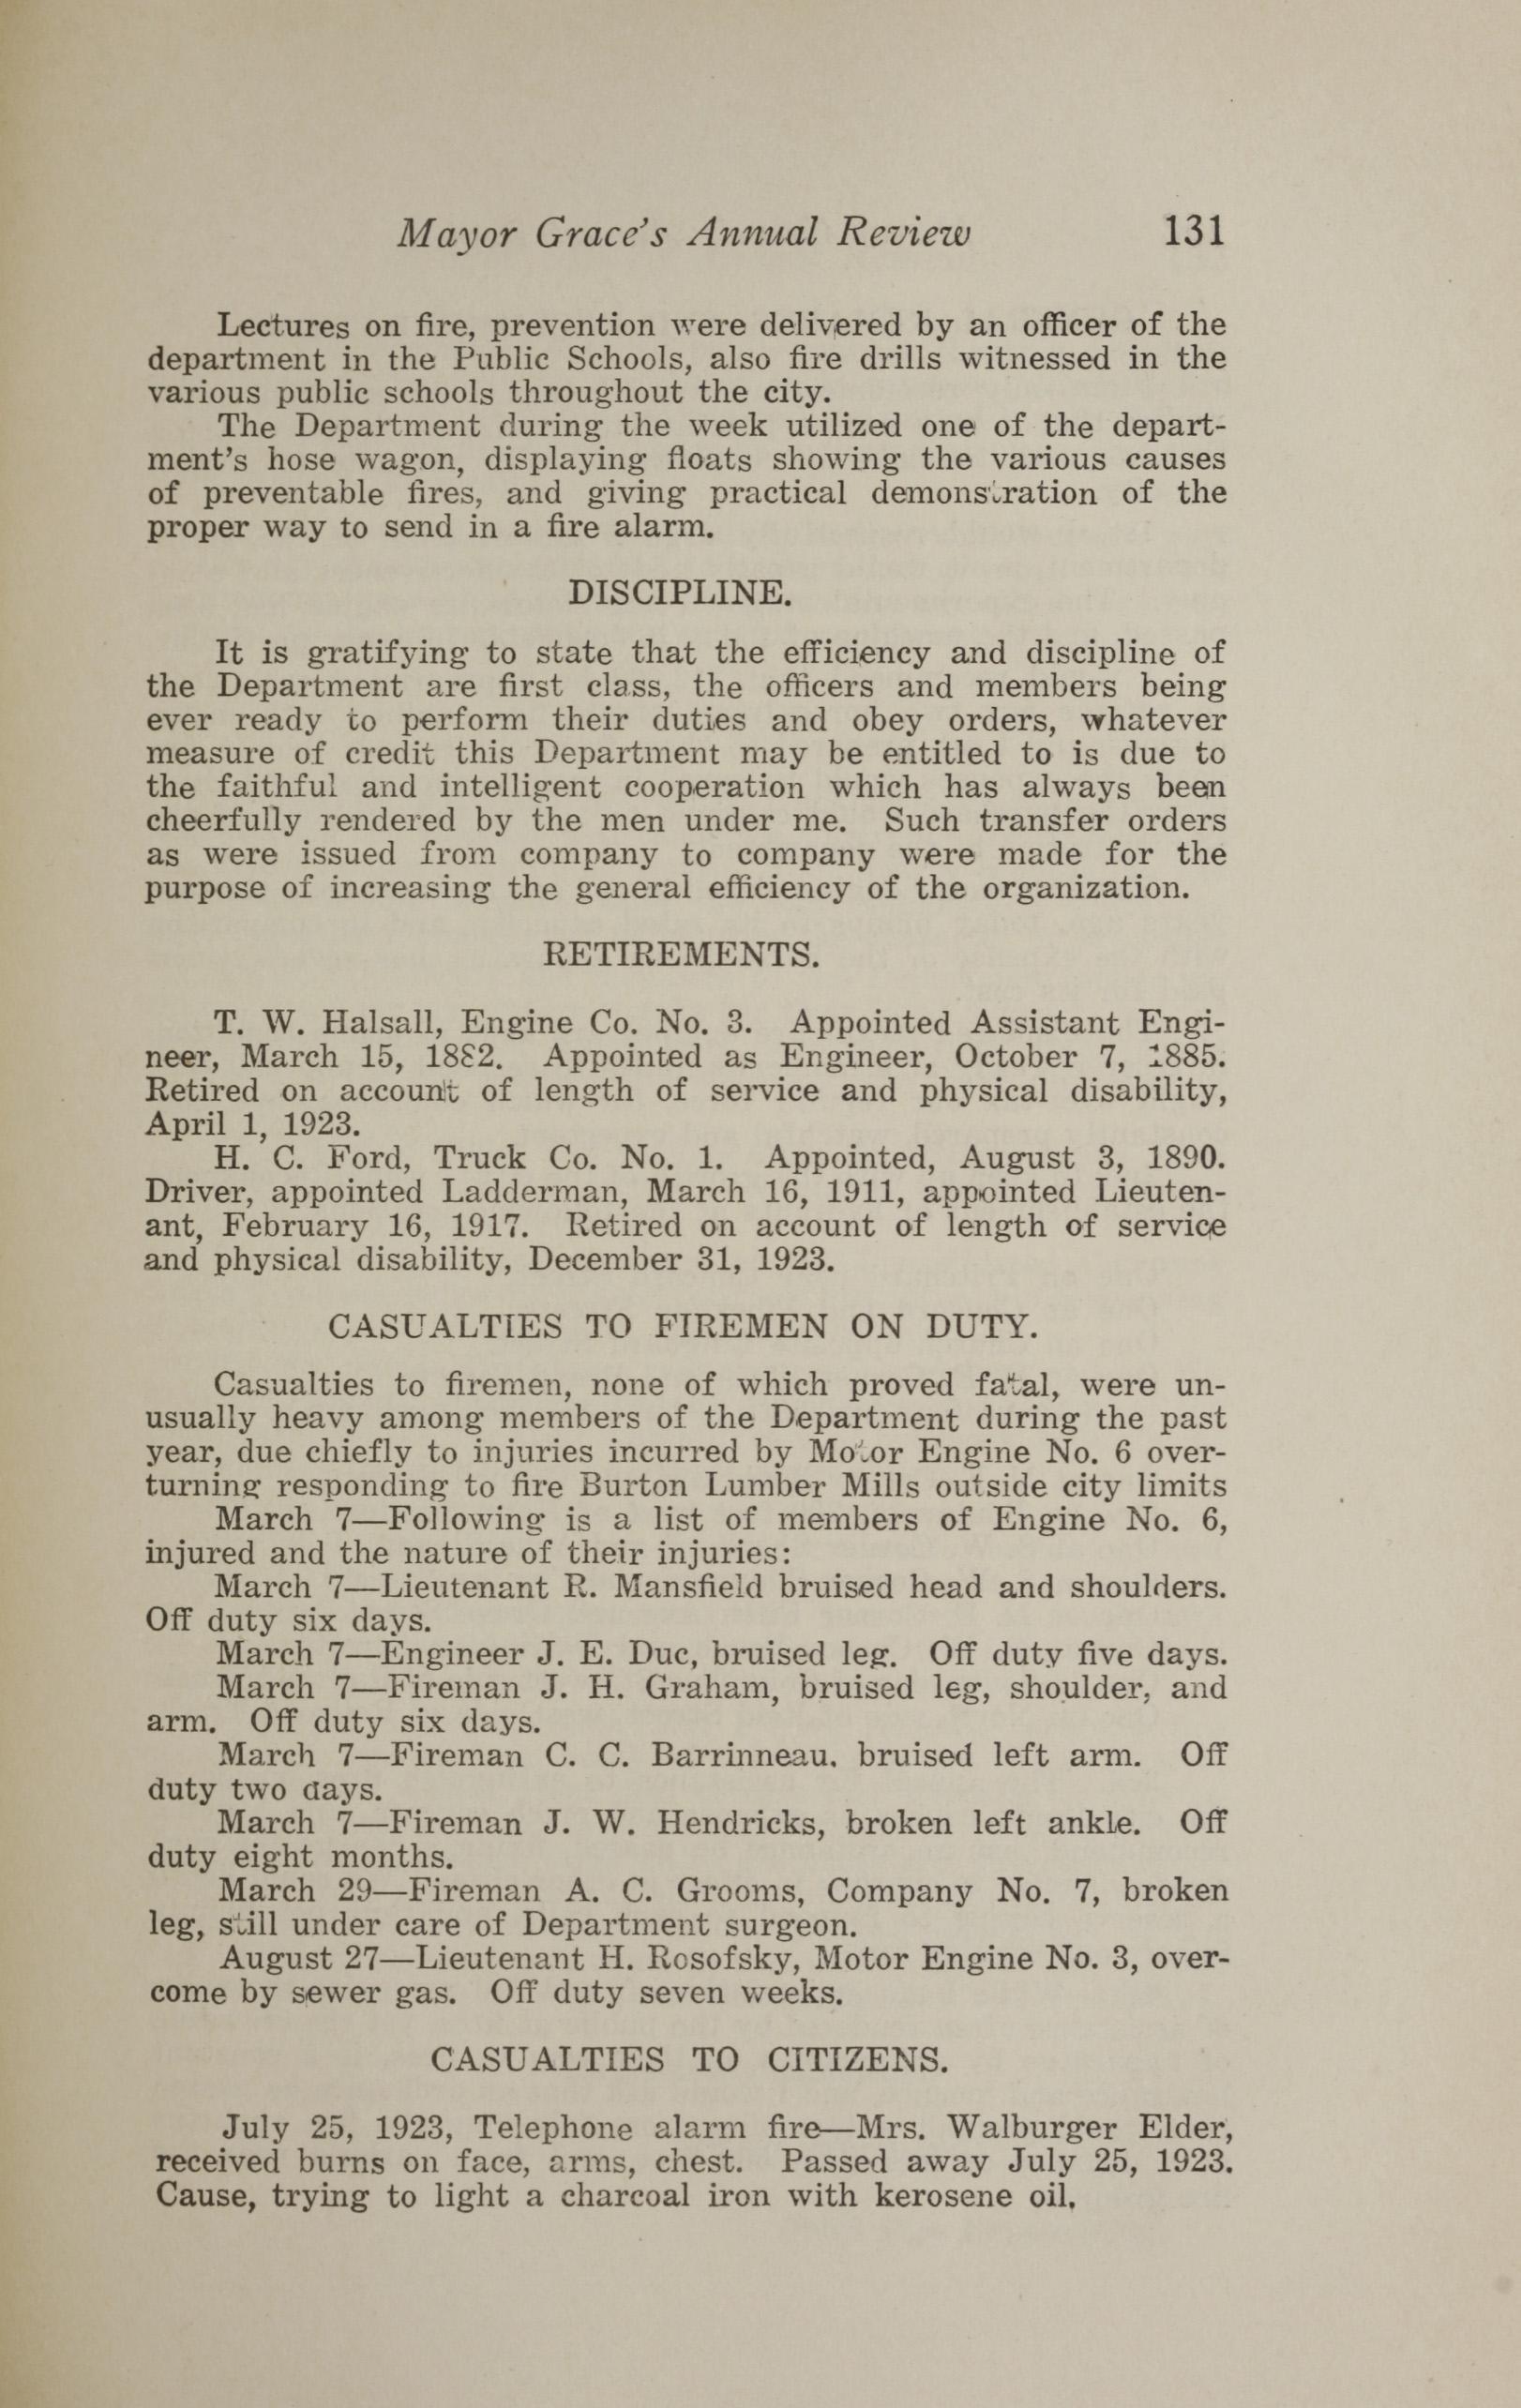 Charleston Yearbook, 1923, page 131